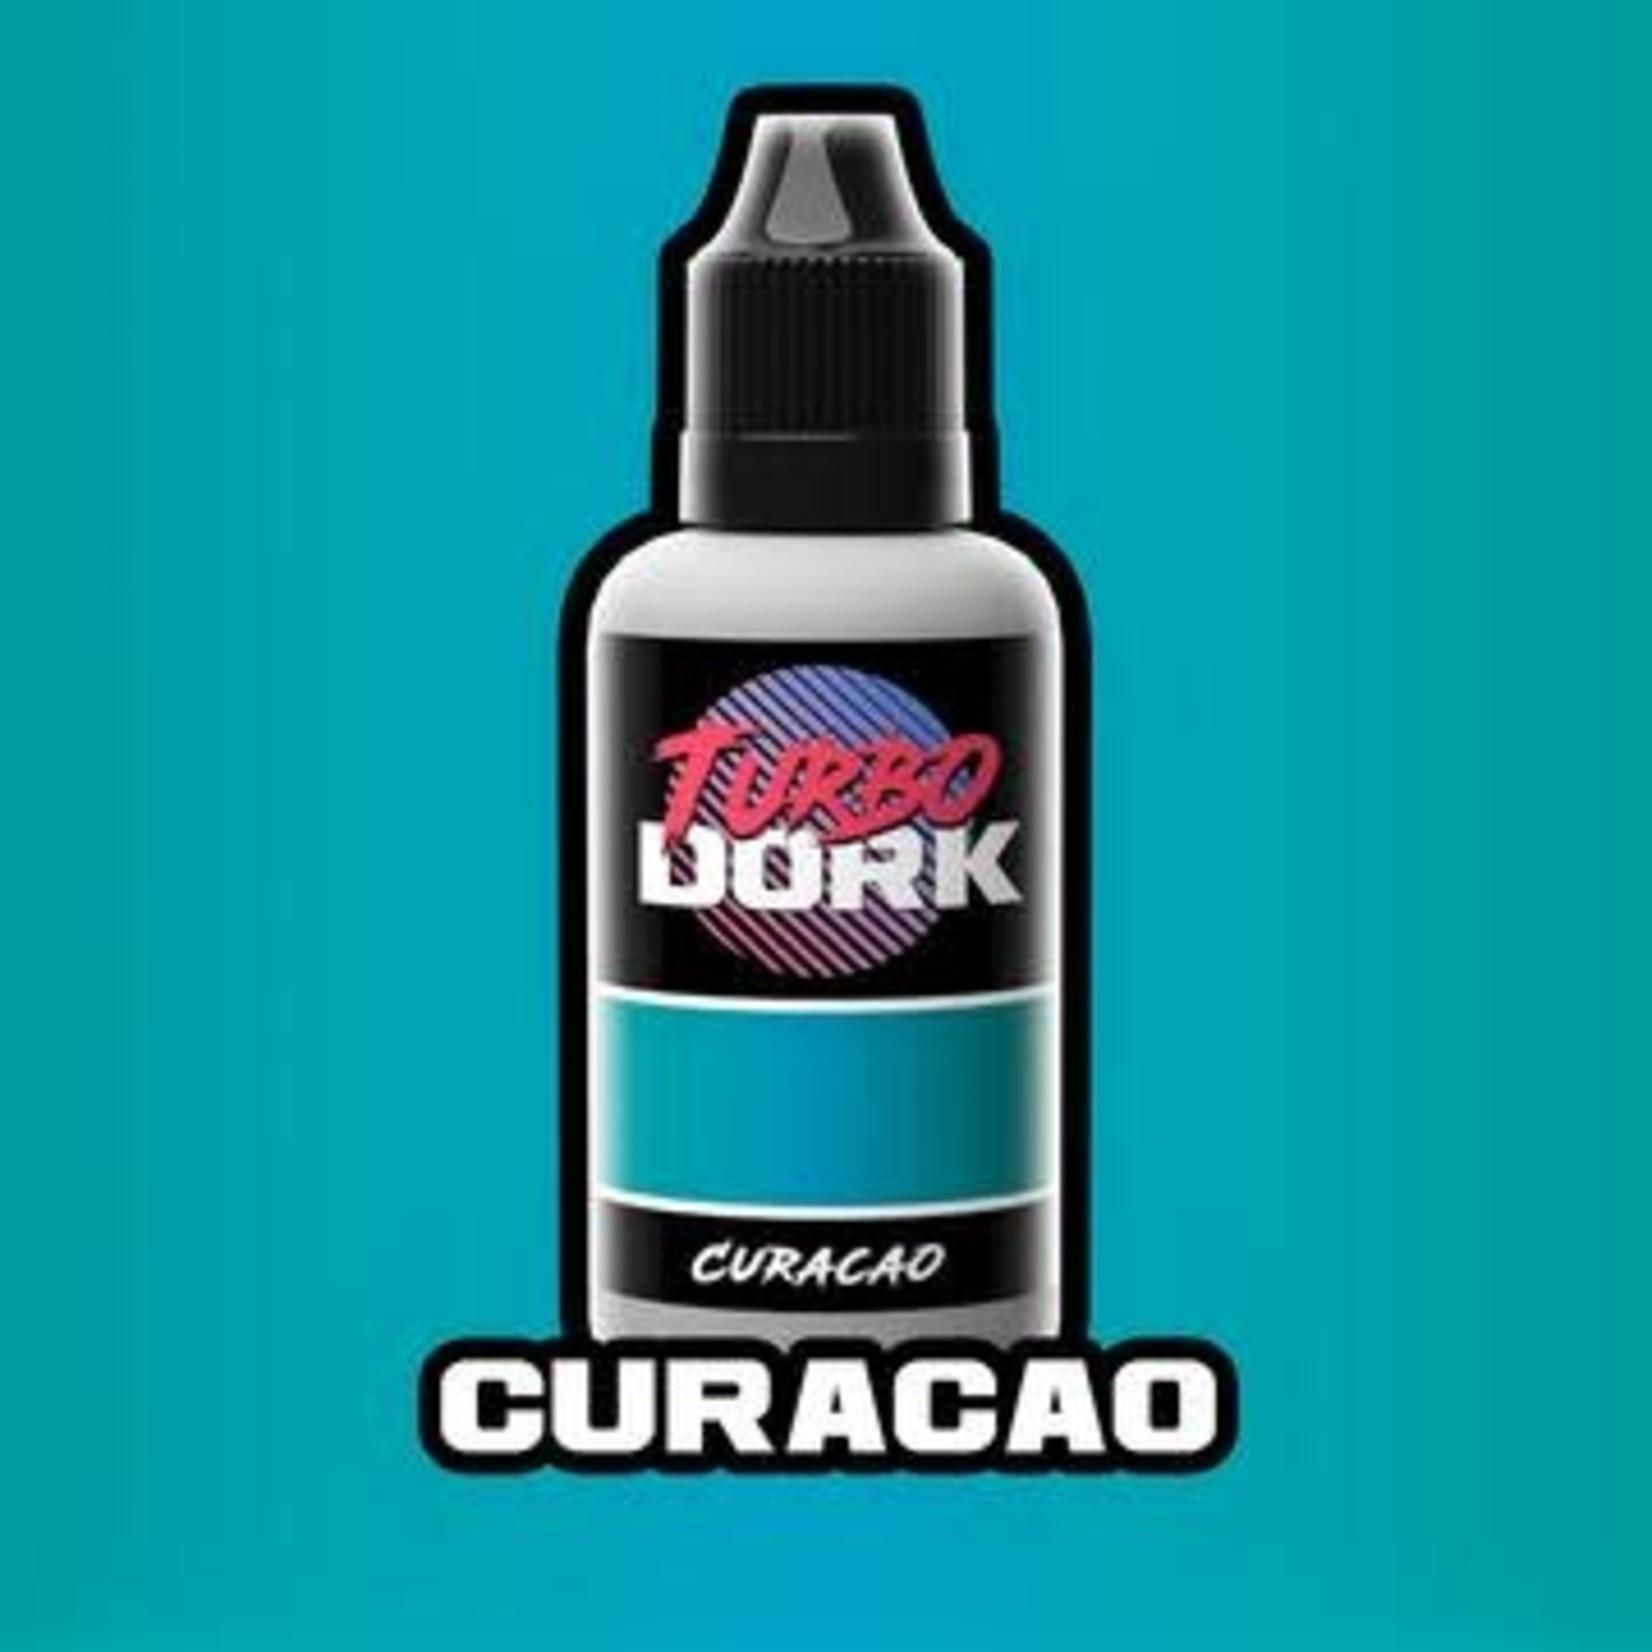 Turbo Dork Turbo Dork Curacao Metallic Acrylic Paint 20ml Bottle